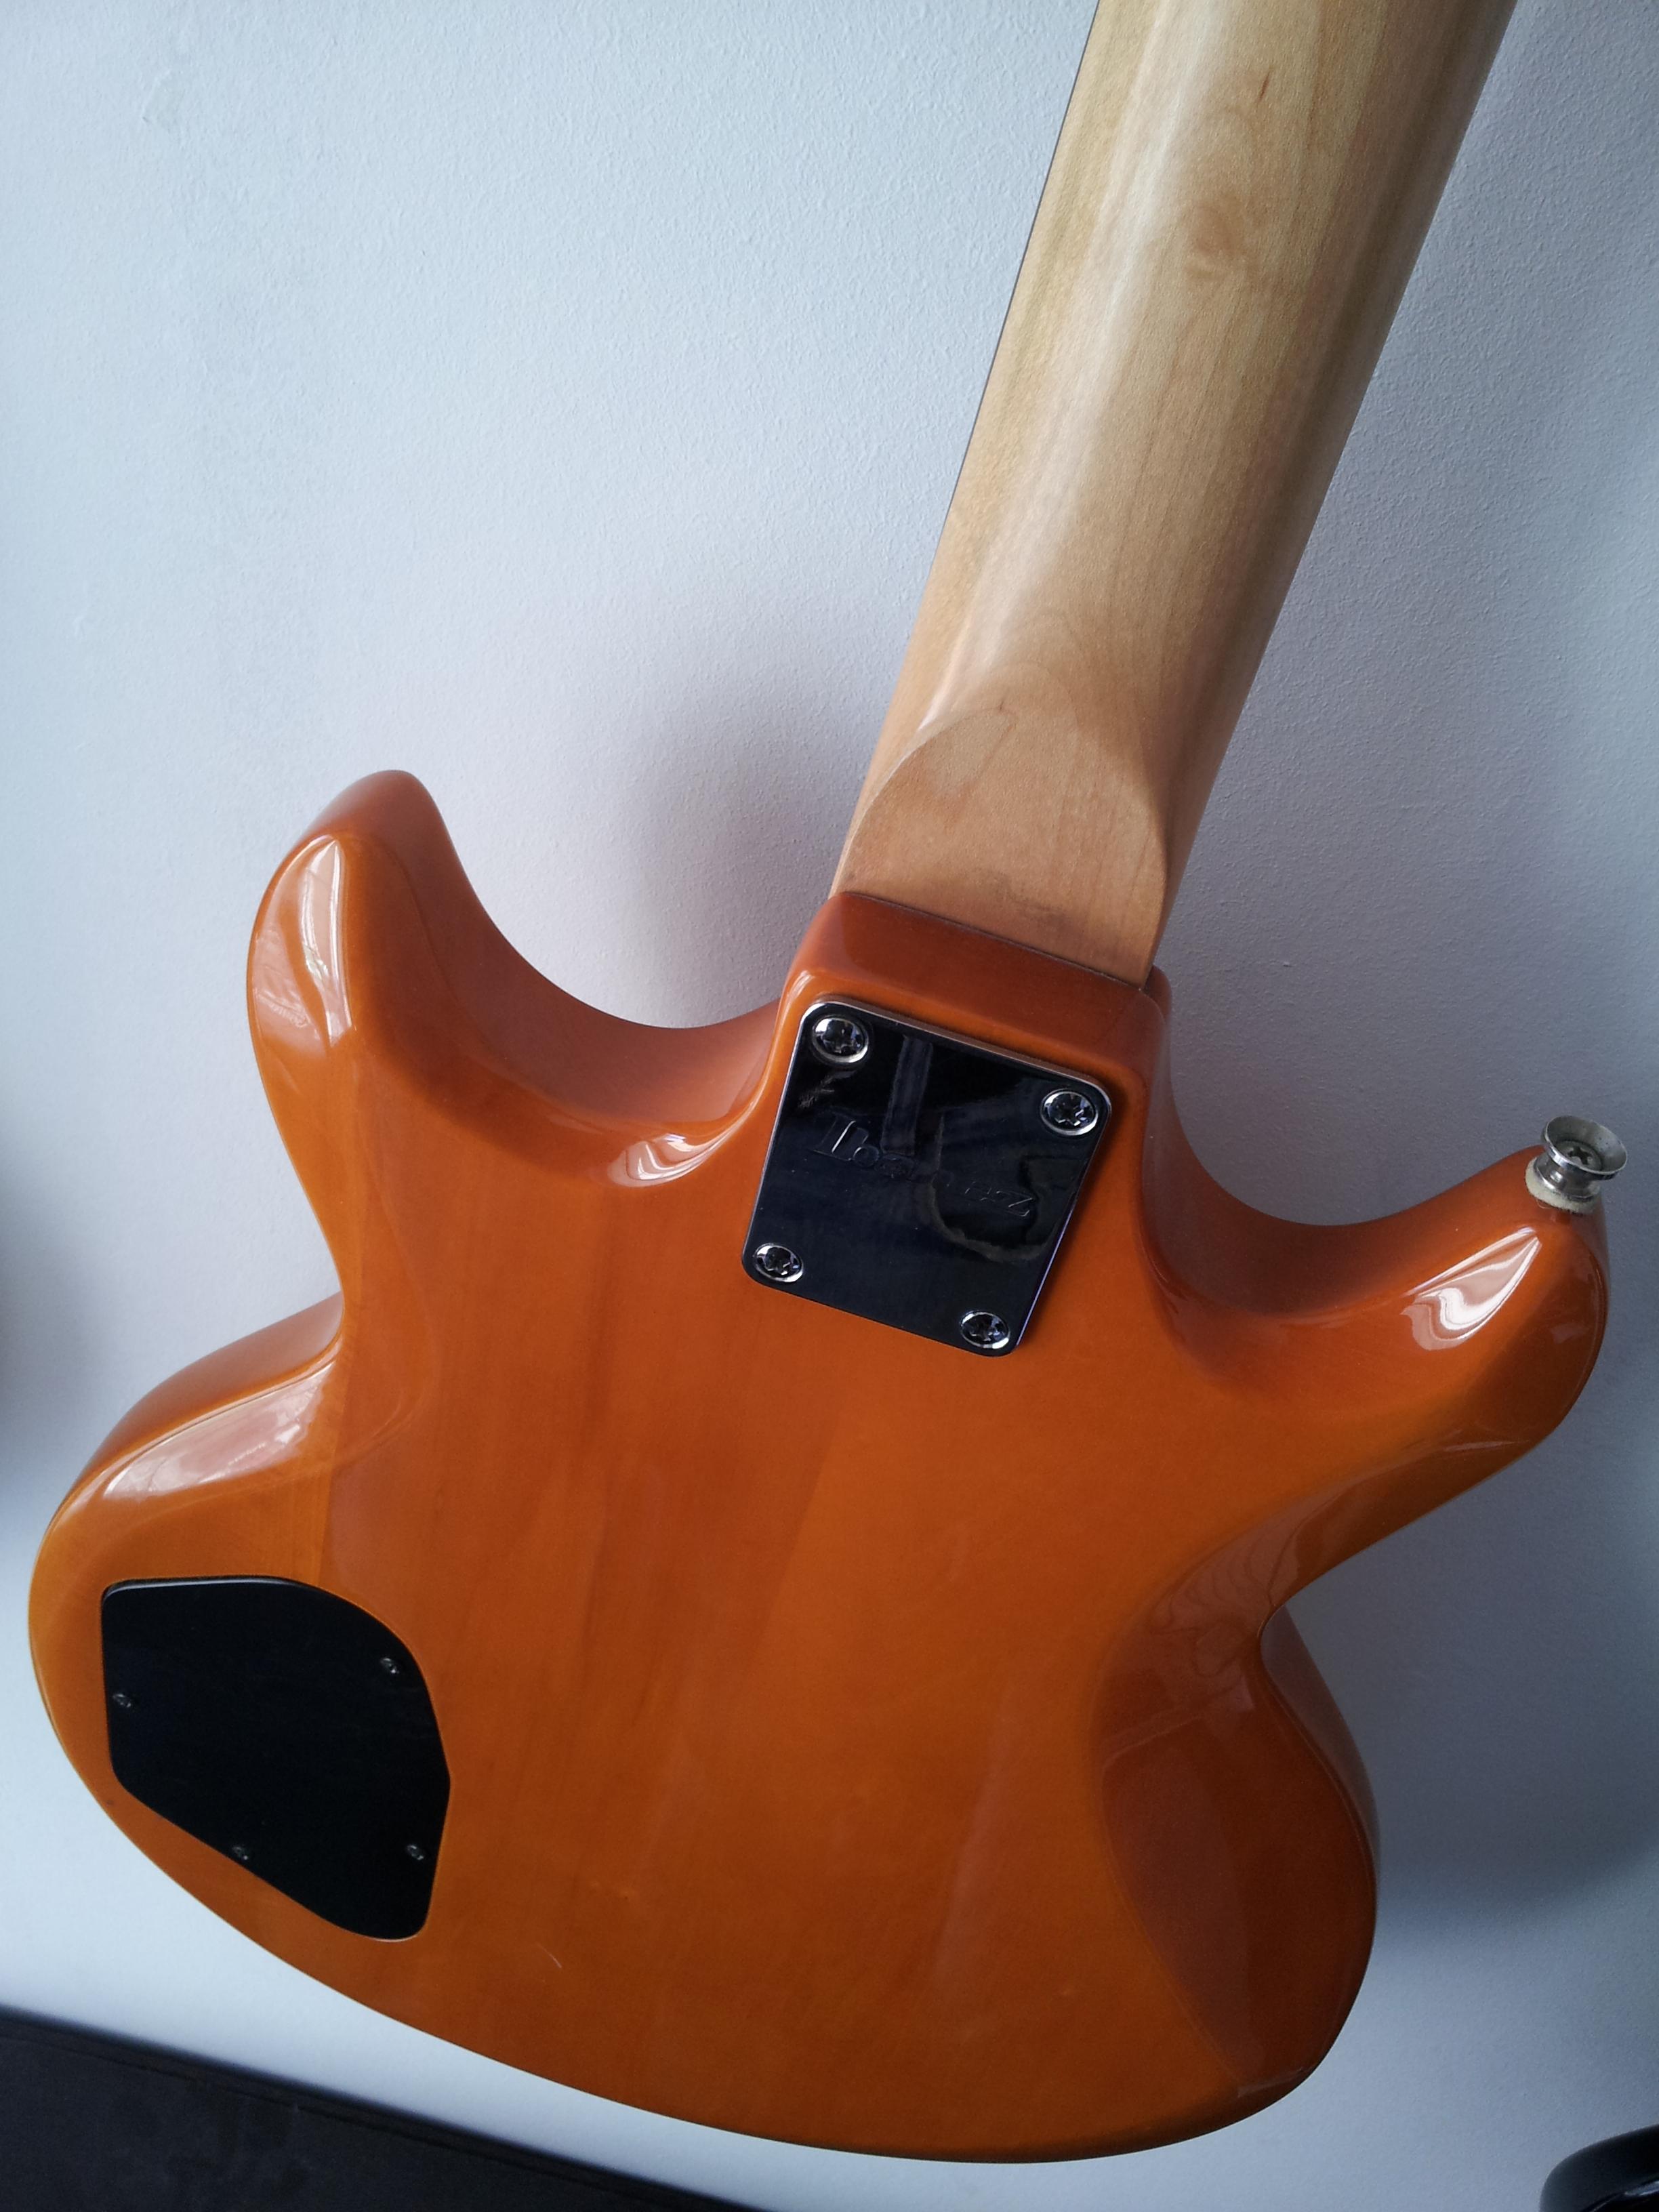 Wonderful Hss Strat Wiring Thick Di Marizo Solid Strat Hss Wiring Free Tsb Youthful Ibanez Gsr100 Bass DarkSolar Panel Installation Diagram Ibanez GAX70 Image (#594890)   Audiofanzine